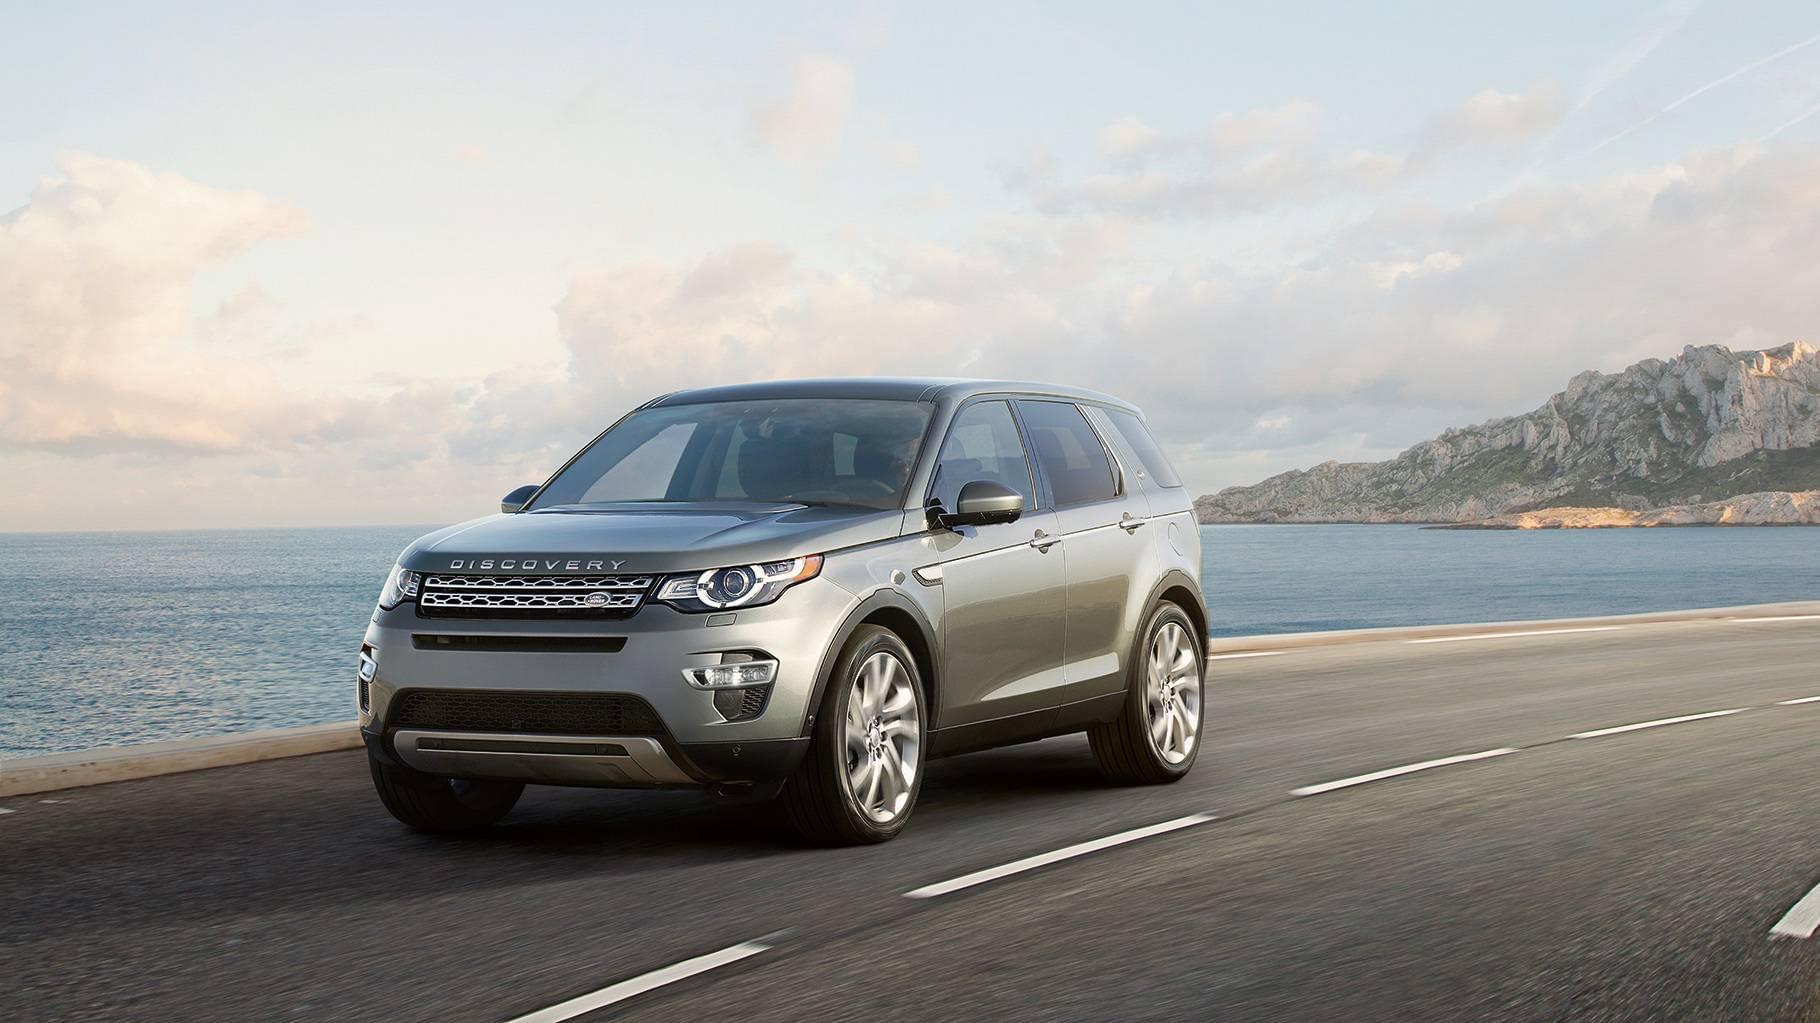 Land Rover Discovery Sport Exterior 2